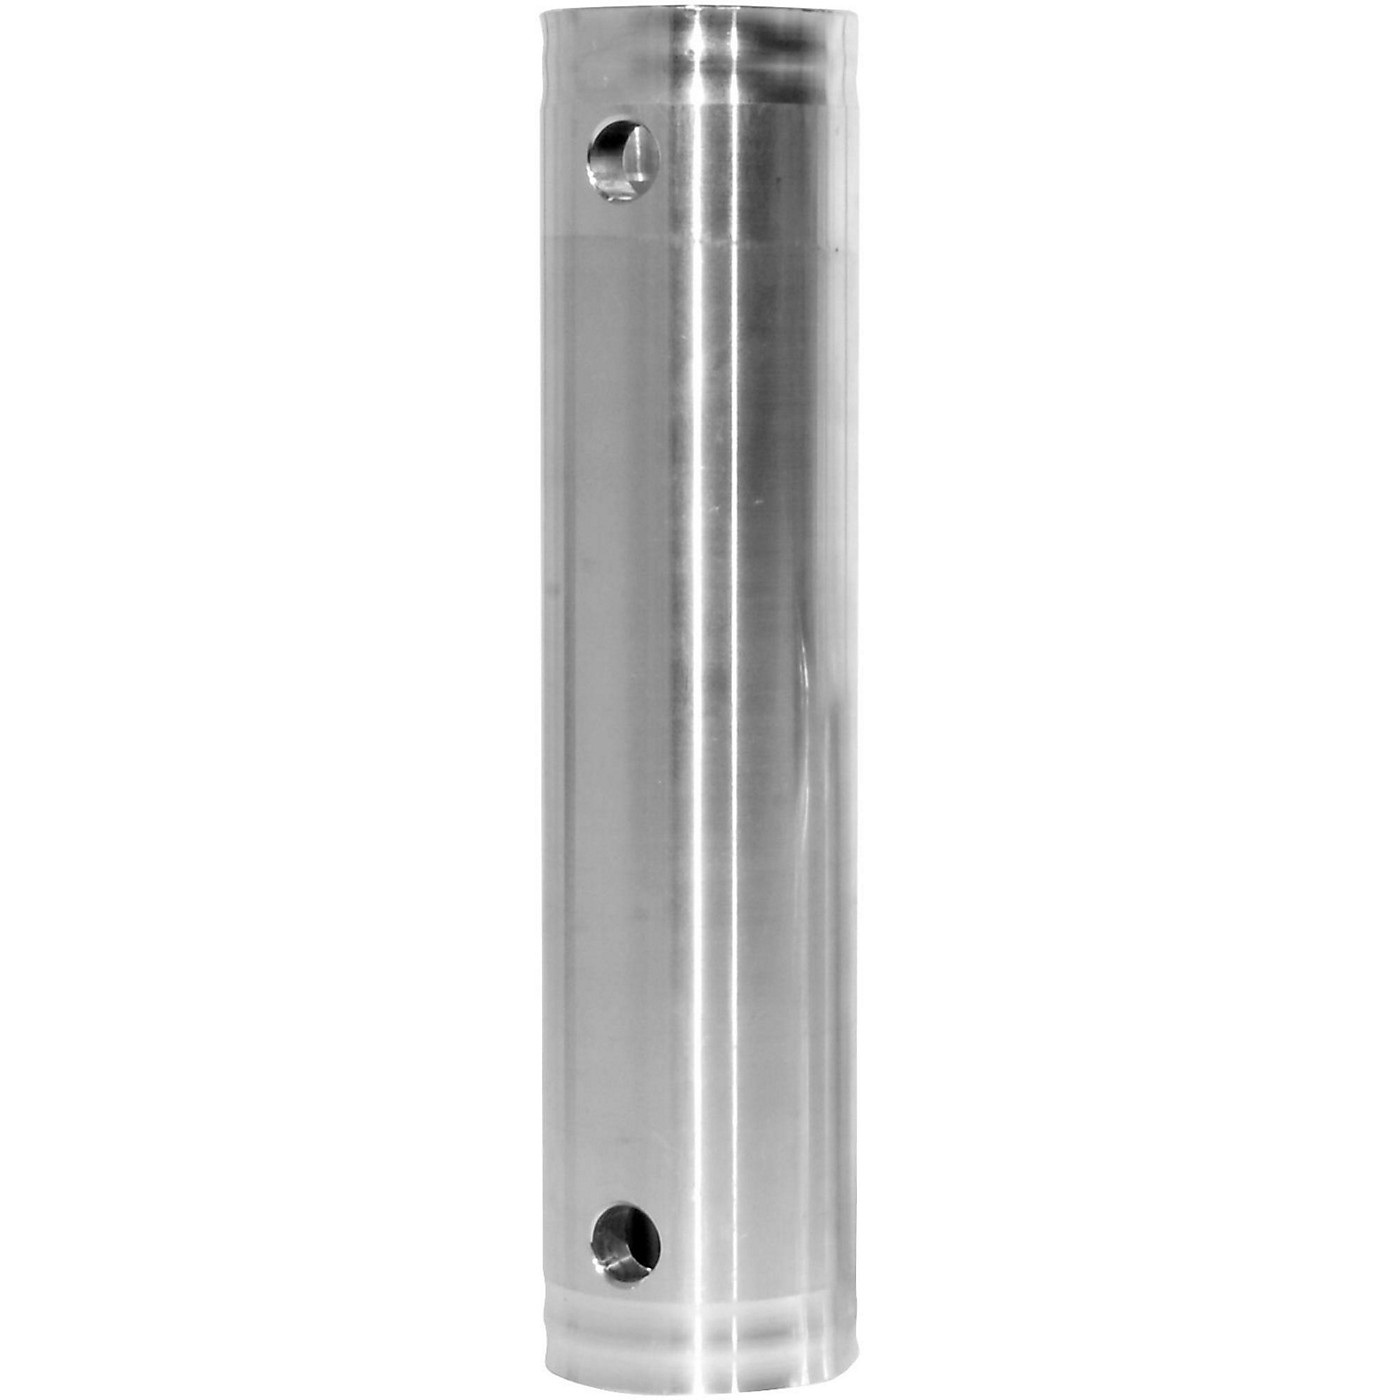 TRUSST 210 mm Truss Spacer Set for CT290 Series 4pcs per set thumbnail